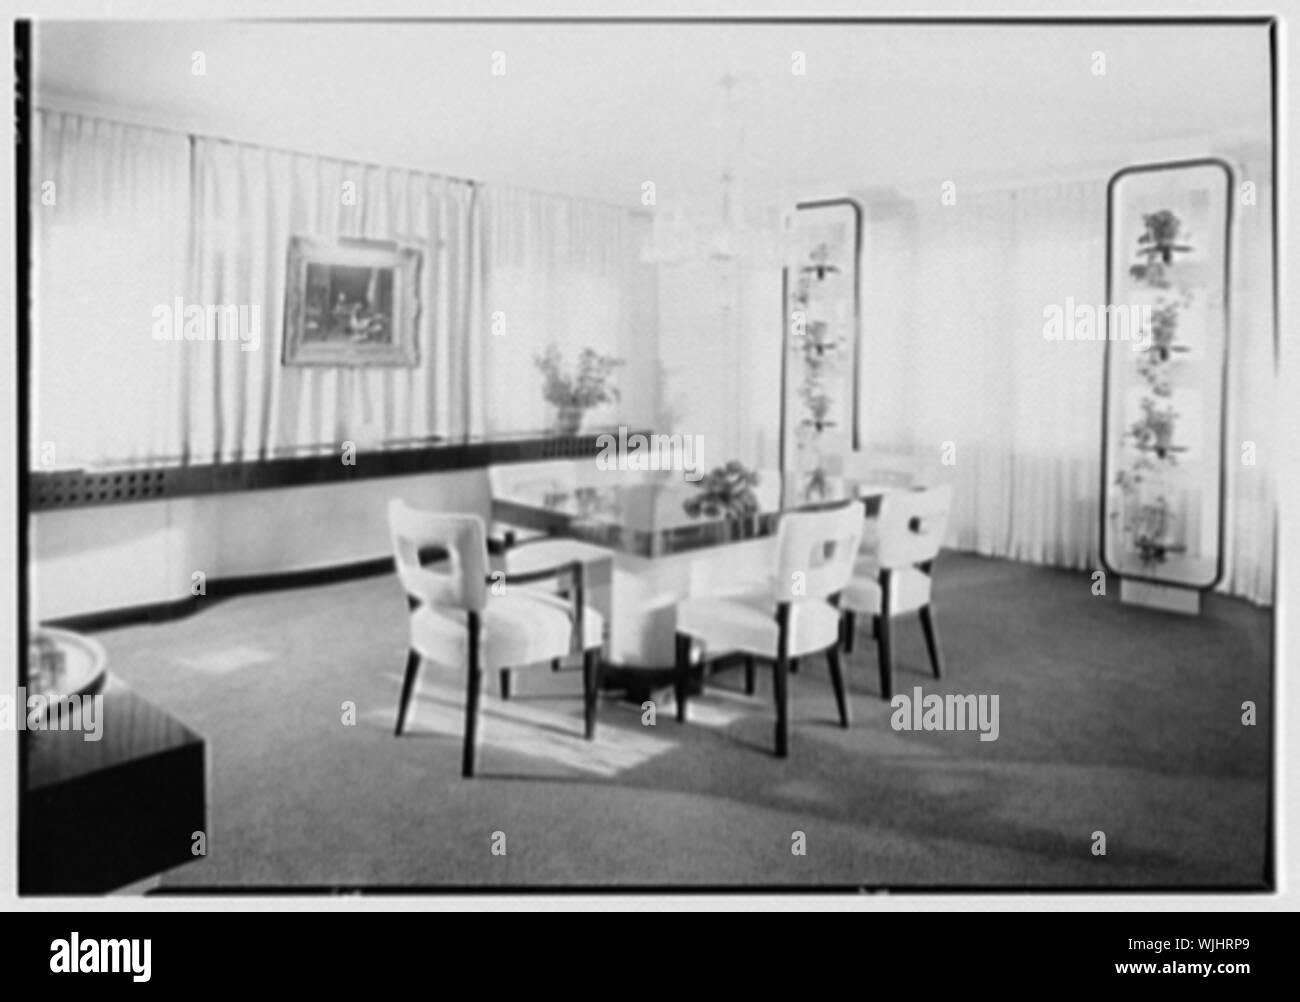 Herman Lowin, residence at 205 Townsend Ave., Pelham Manor, New York. Stock Photo